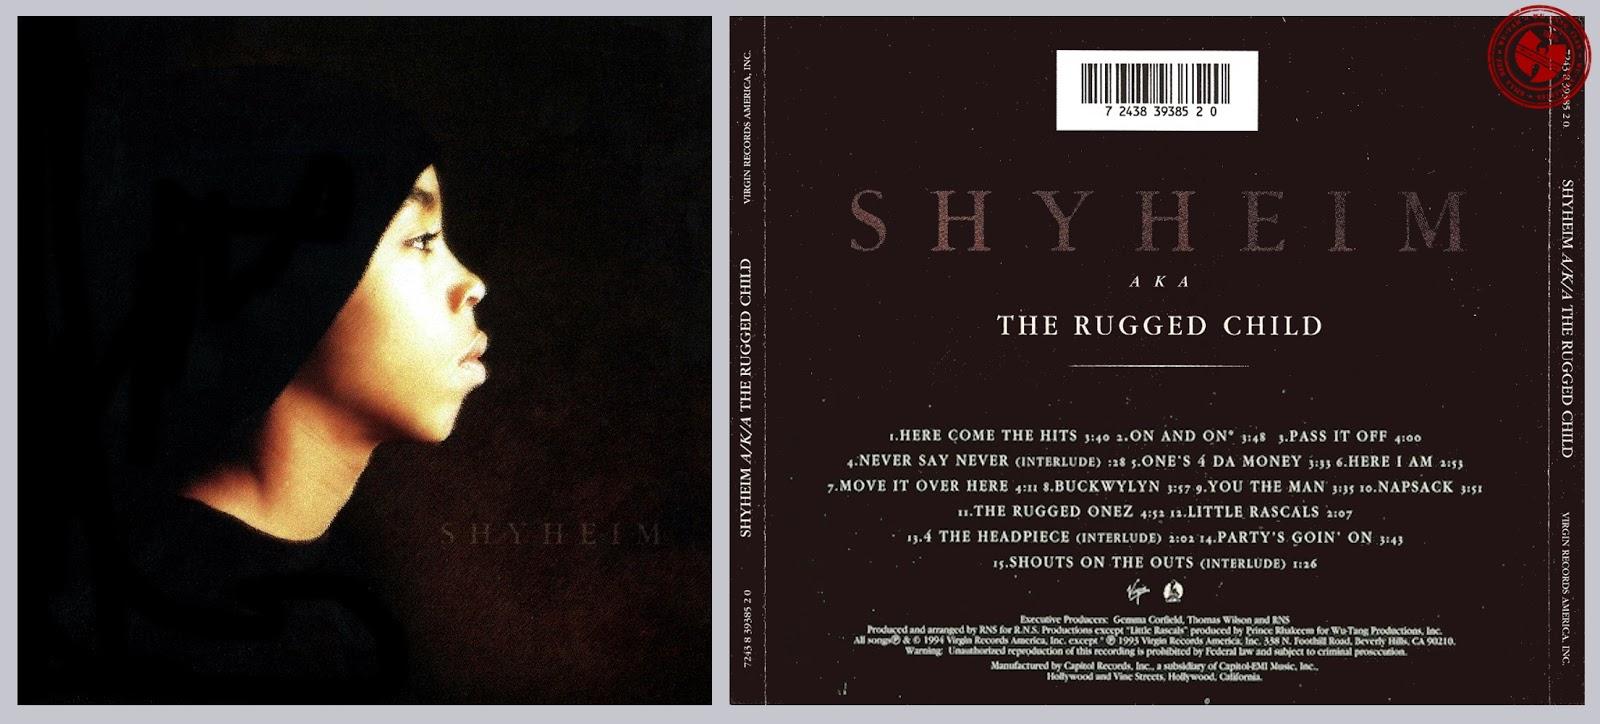 Shyheim Aka The Rugged Child Turns 25